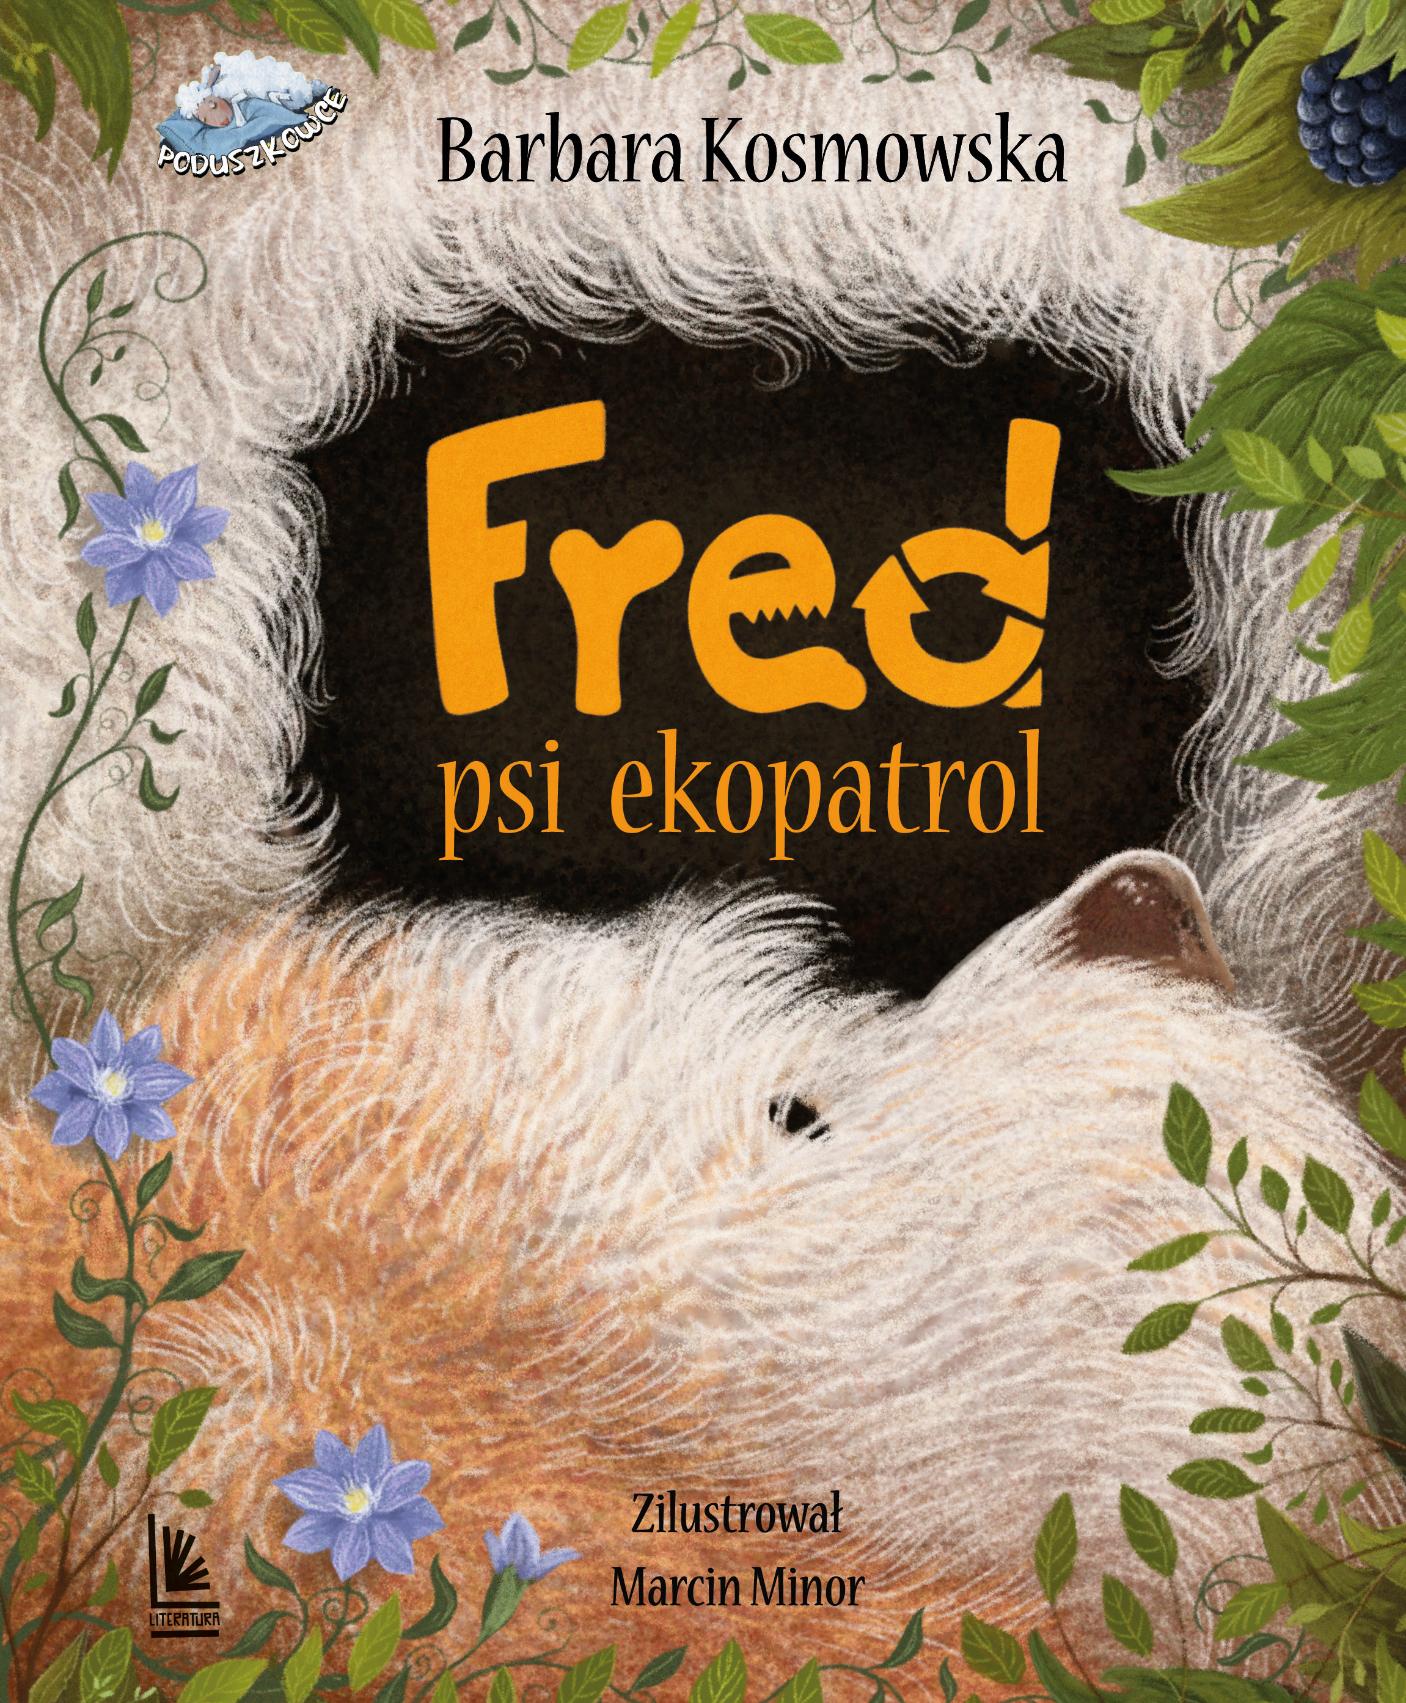 Fred, psi ekopatrol